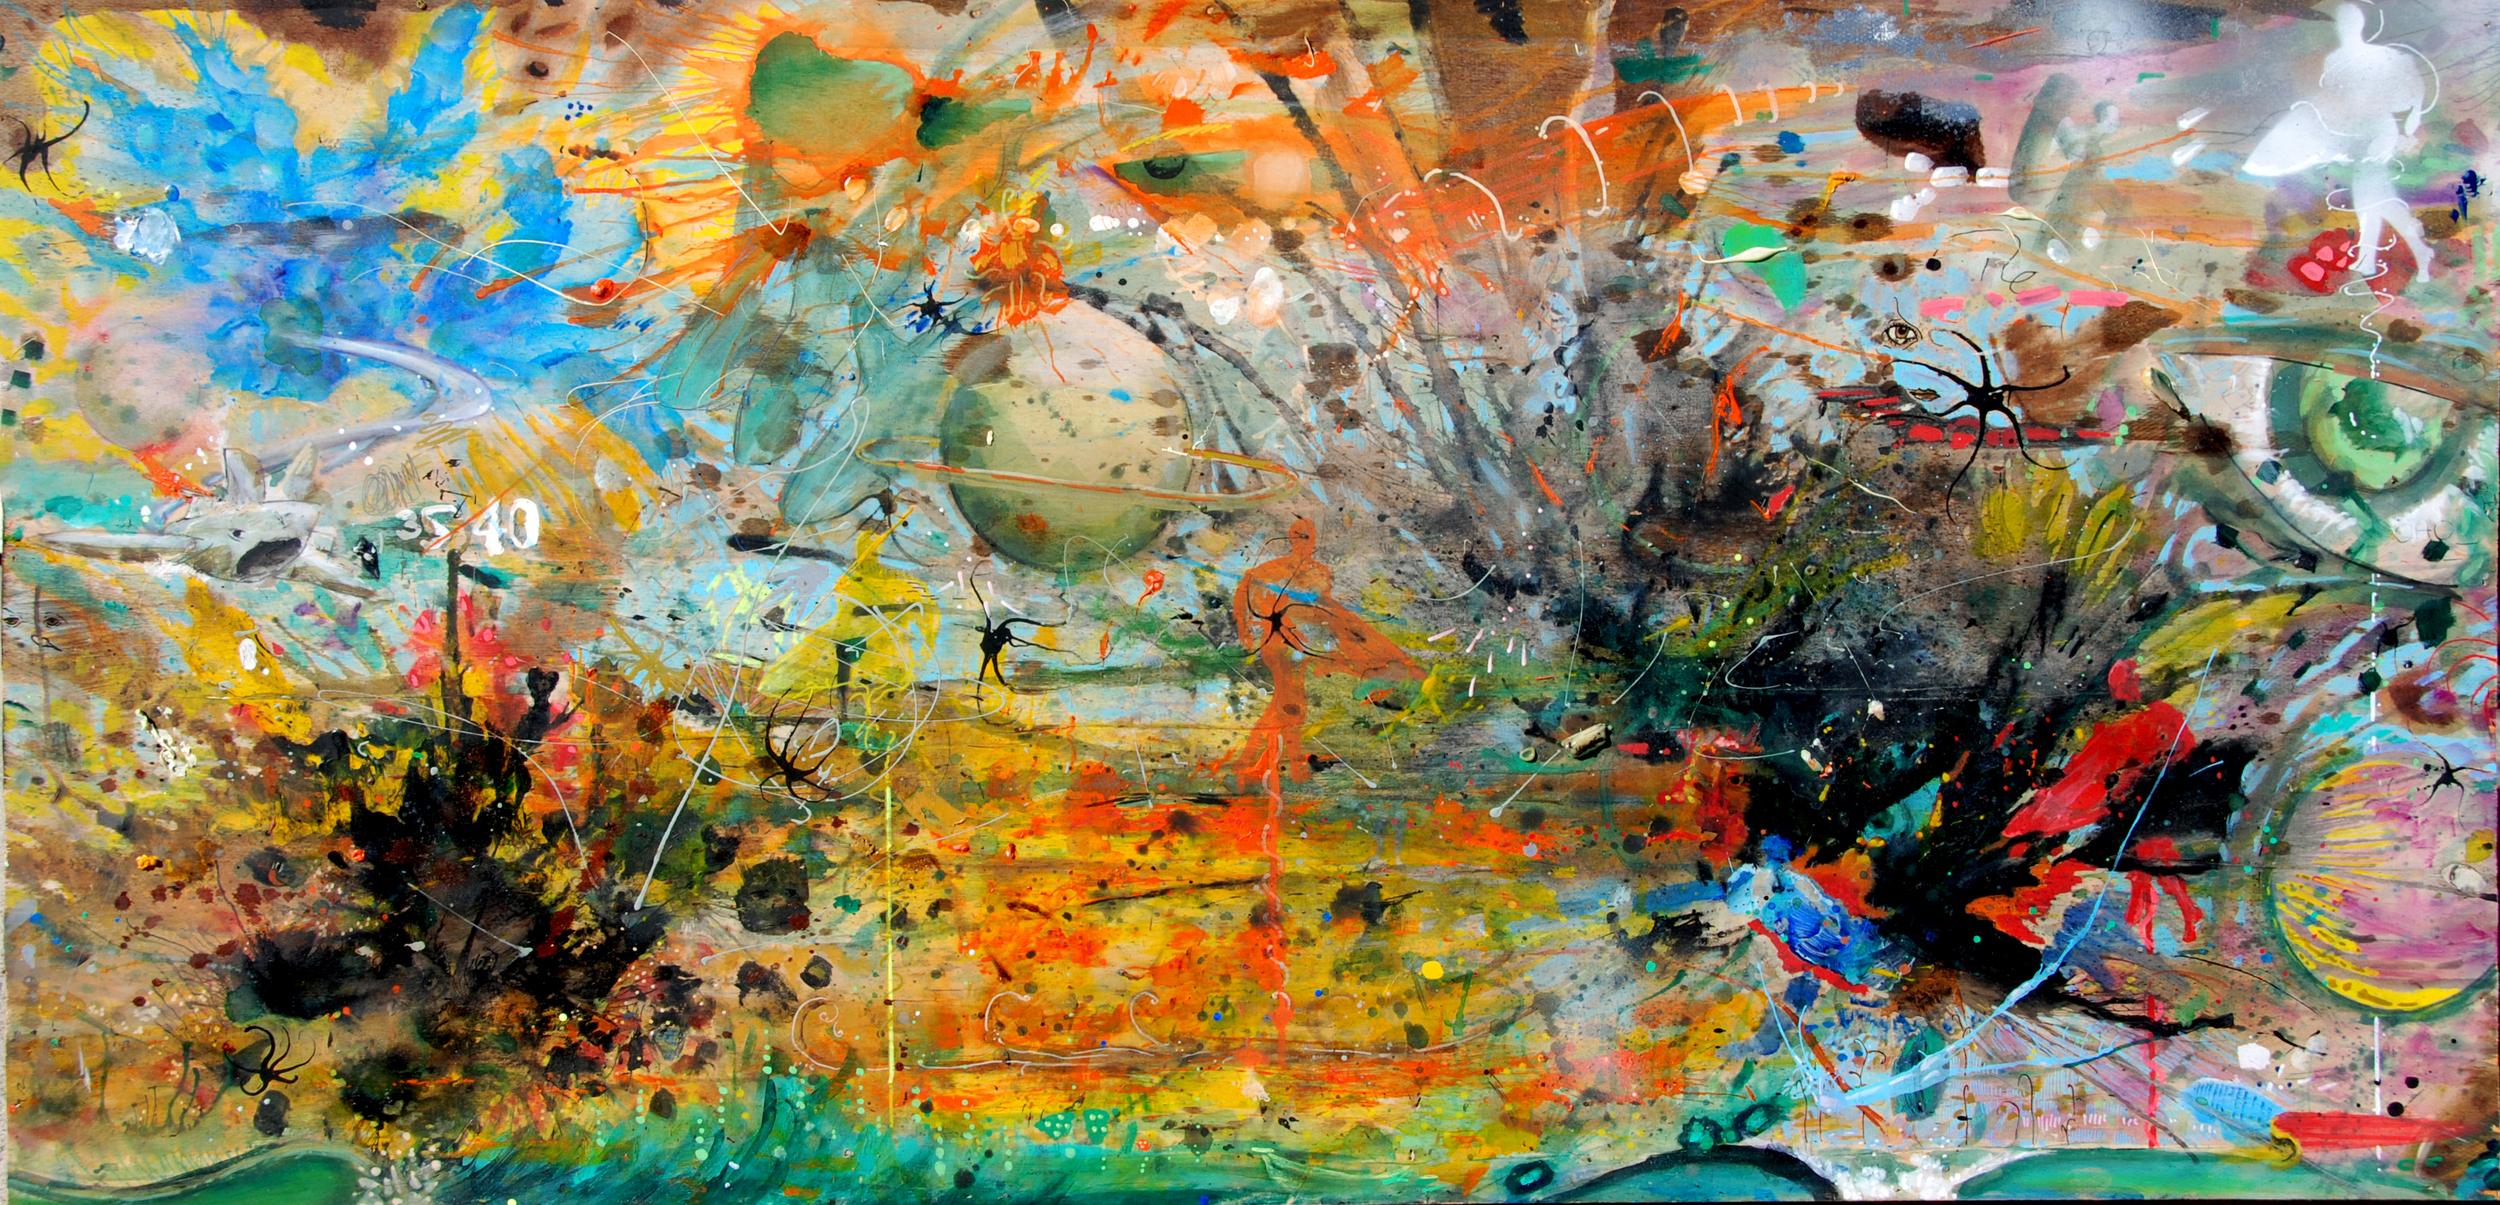 nathan gibbs-the escalation of committment-24x48-mixed media on panel.jpg